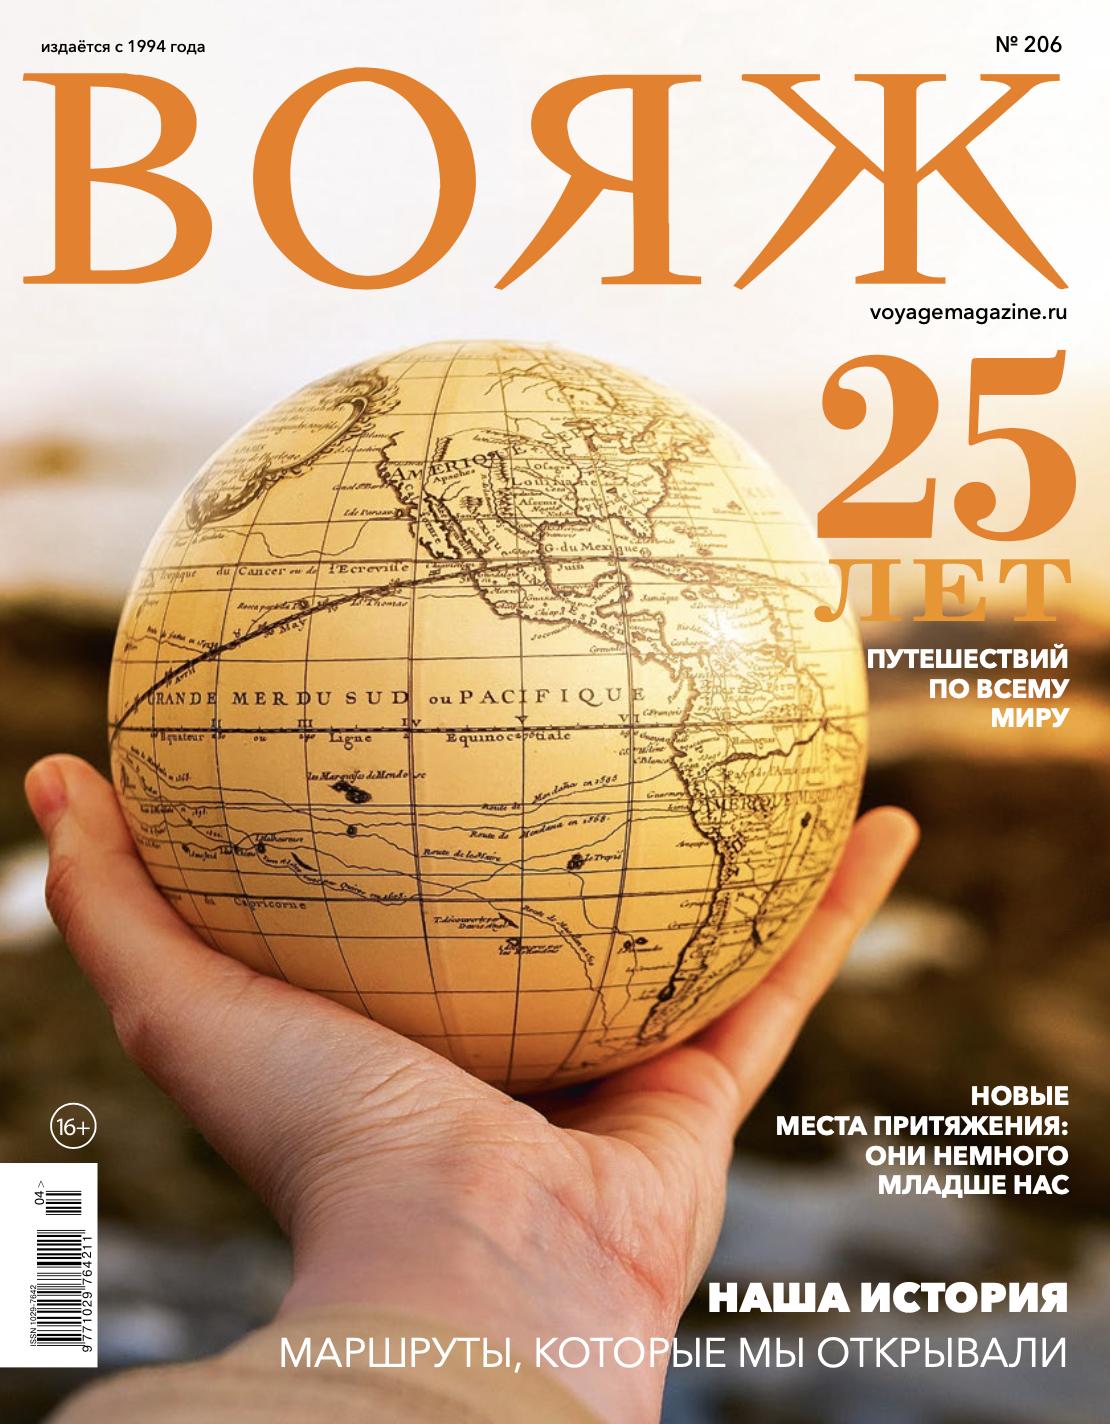 http://voyagemagazine.ru/wp-content/uploads/2020/03/206.png